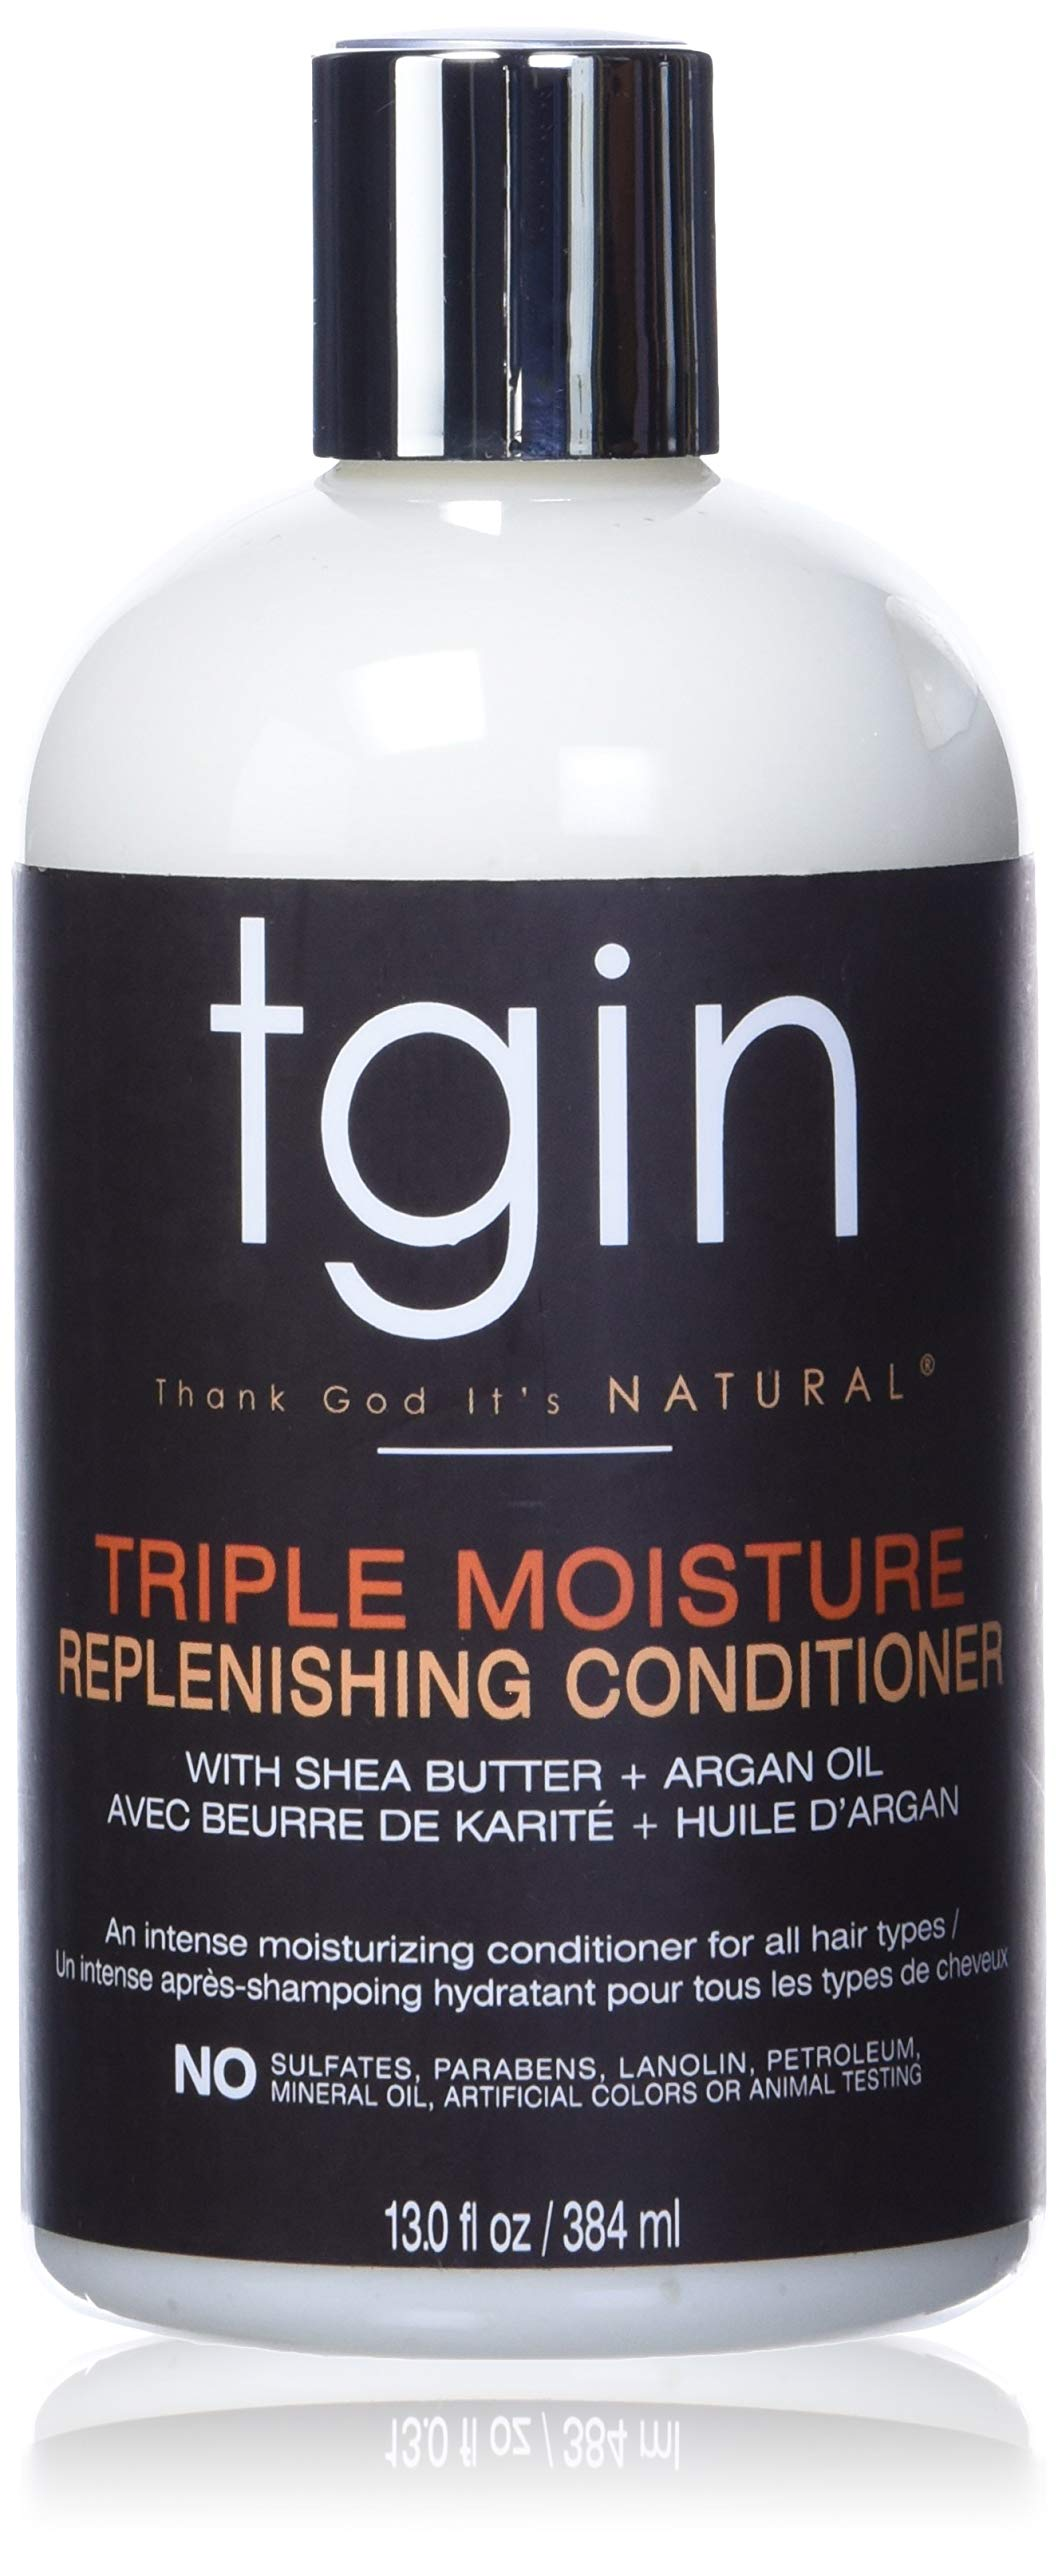 TGIN Thank God It's Natural Triple Moisture Replenishing Conditioner With Shea Butter + Argan Oil 13 fl oz